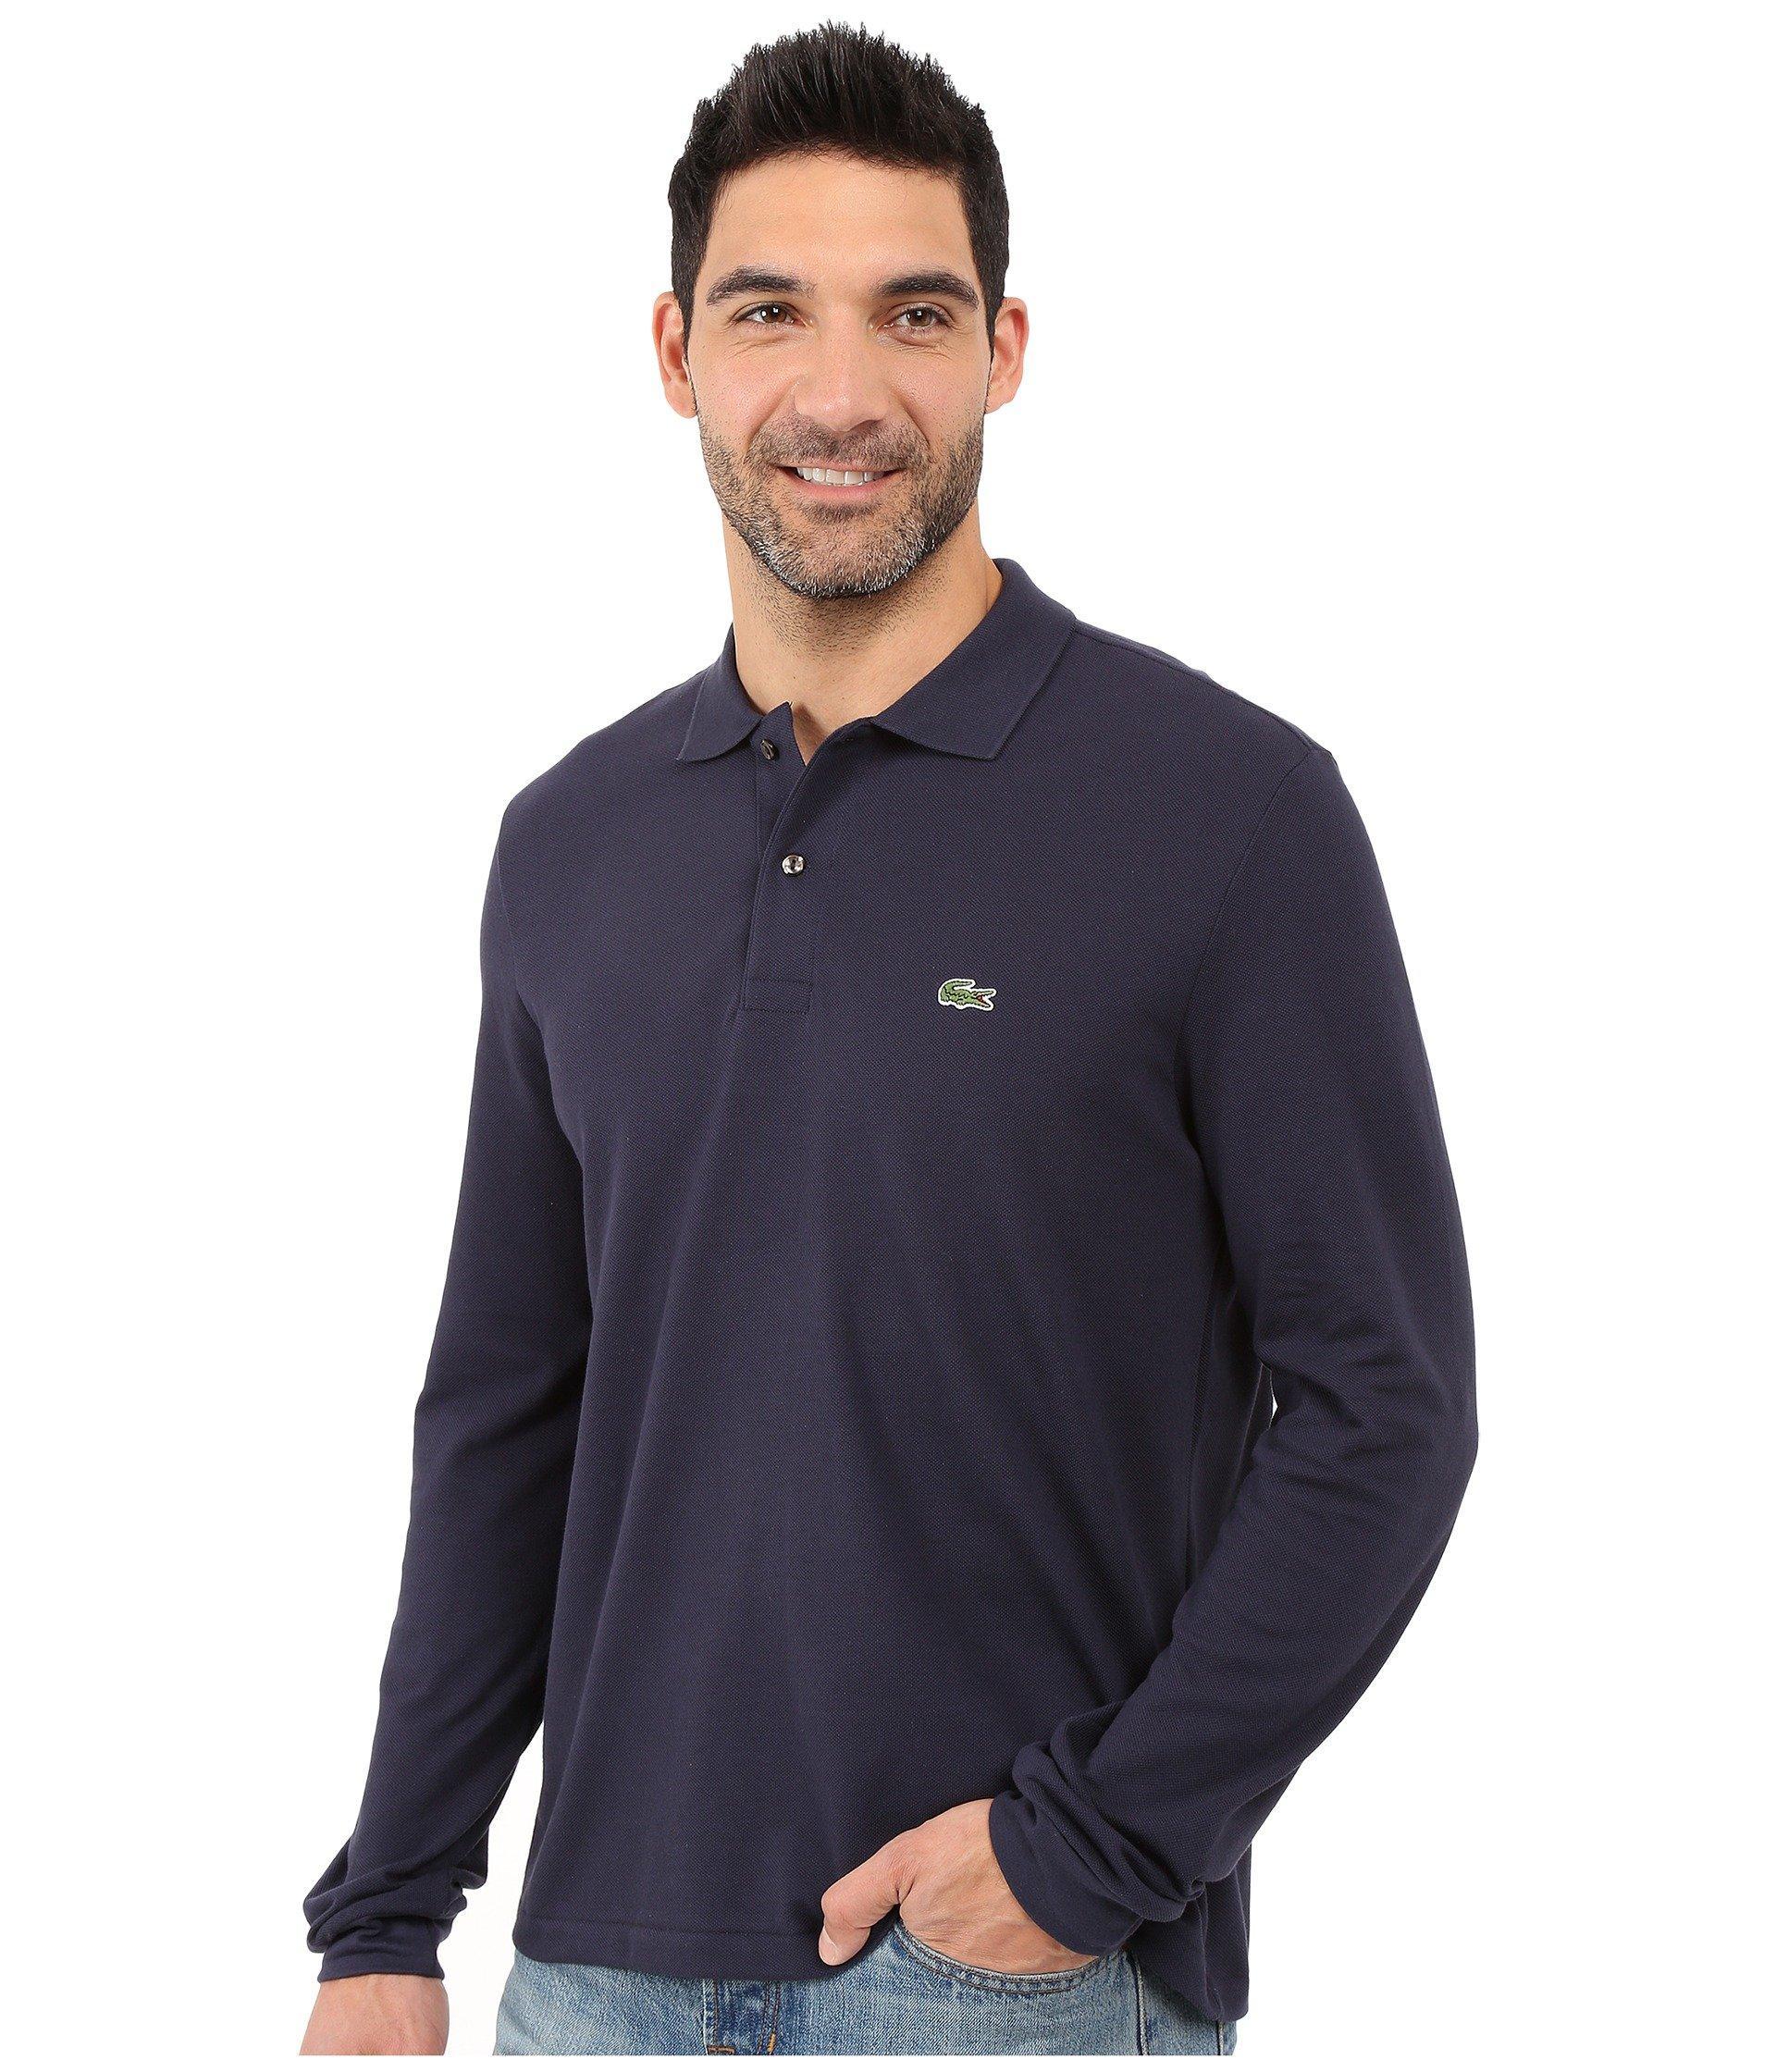 Lacoste Mens Long Sleeve Chine Classic Pique L.12.12 Original Fit Polo Shirt